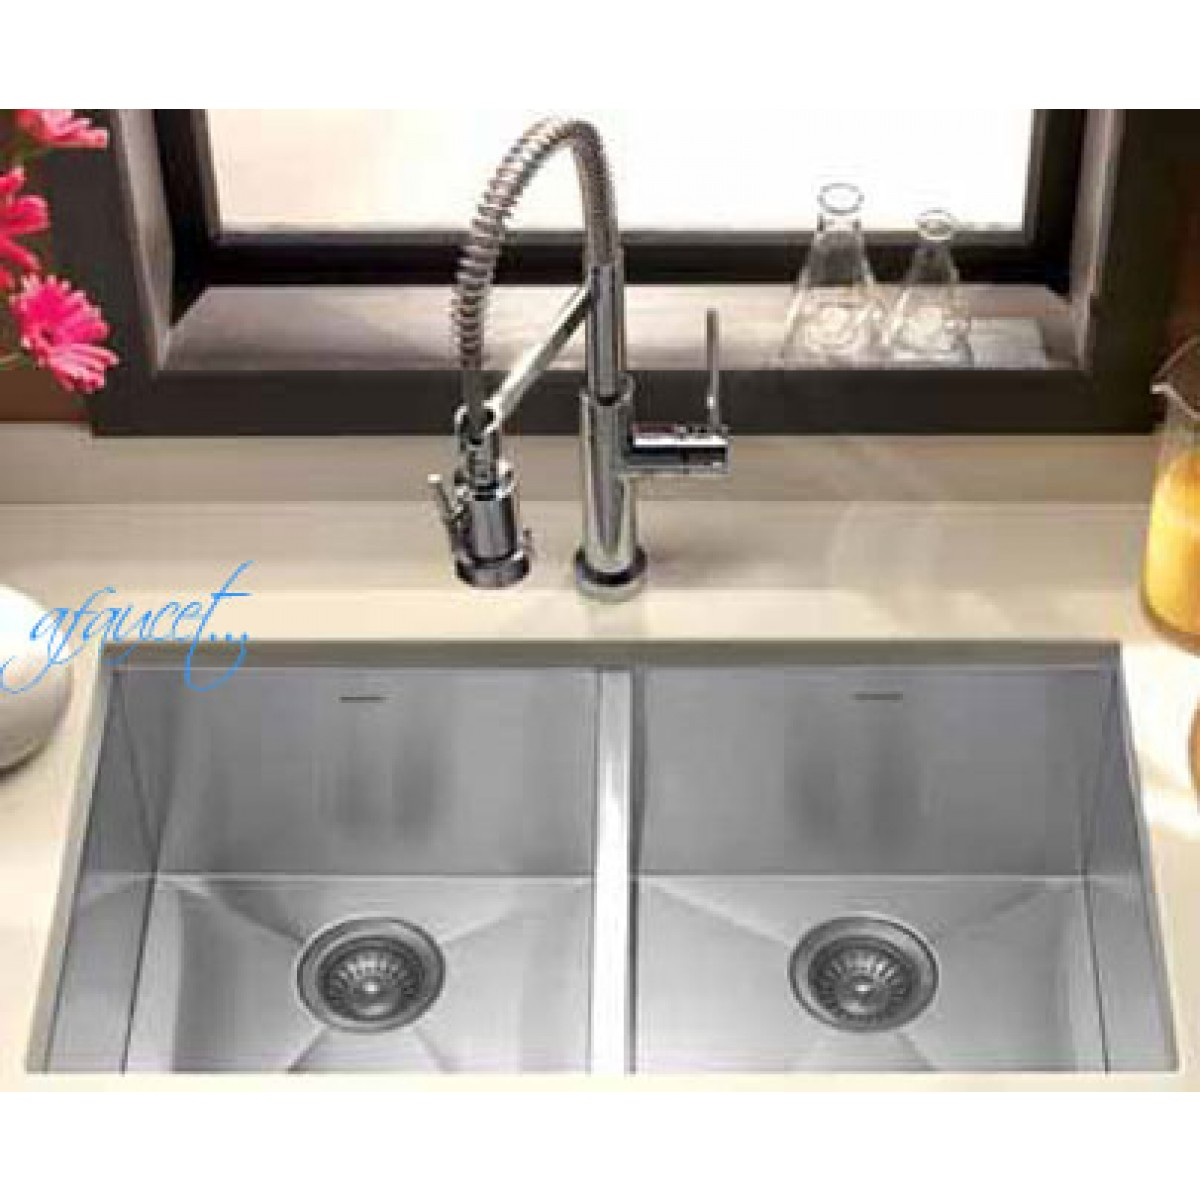 37 Inch Stainless Steel Undermount 5050 Double Bowl Kitchen Sink